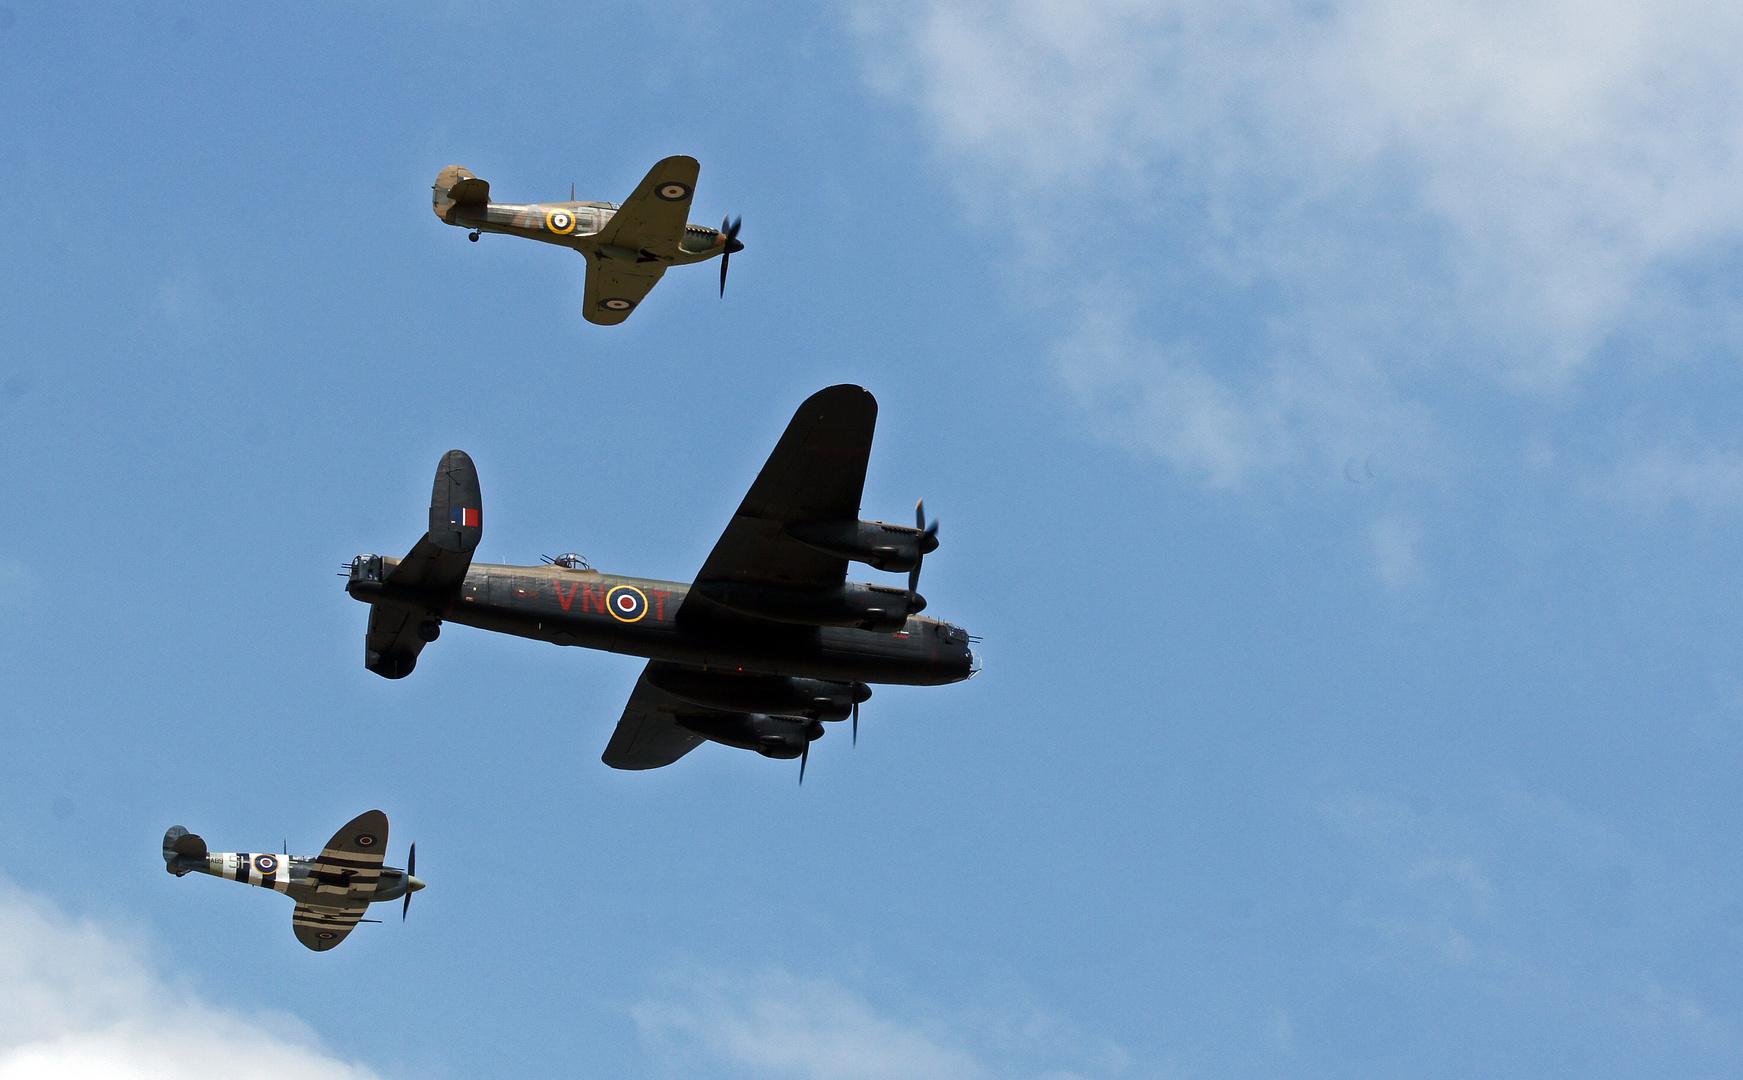 Lancaster - Spitfire - Hurricane